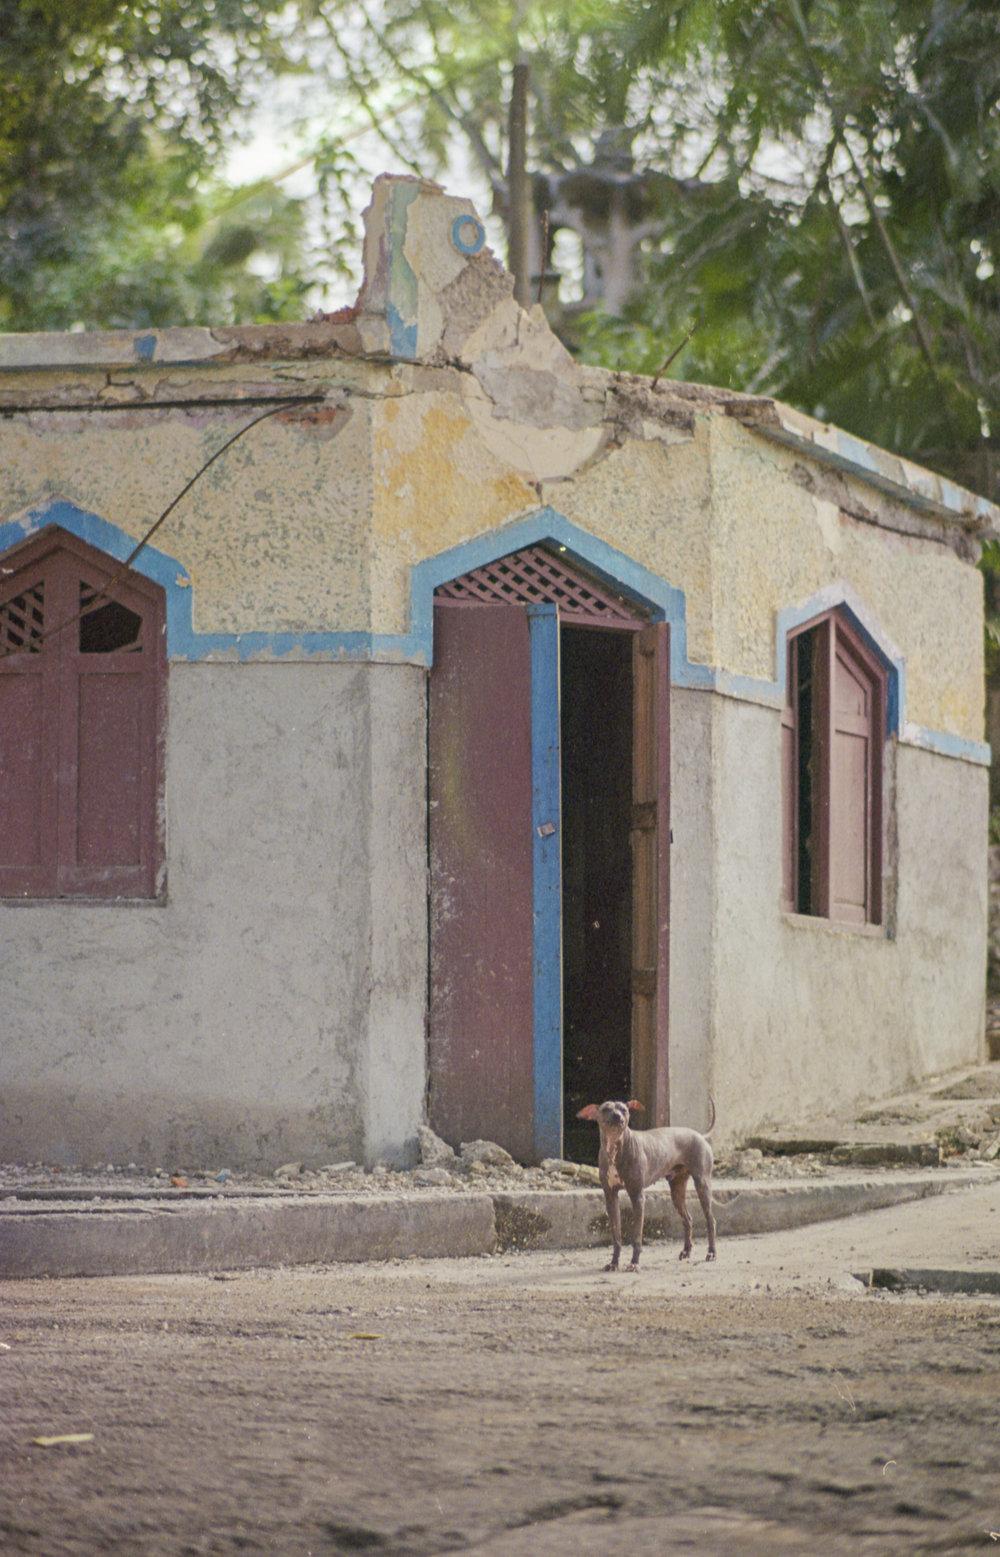 Cuba_Portra002_b.jpg